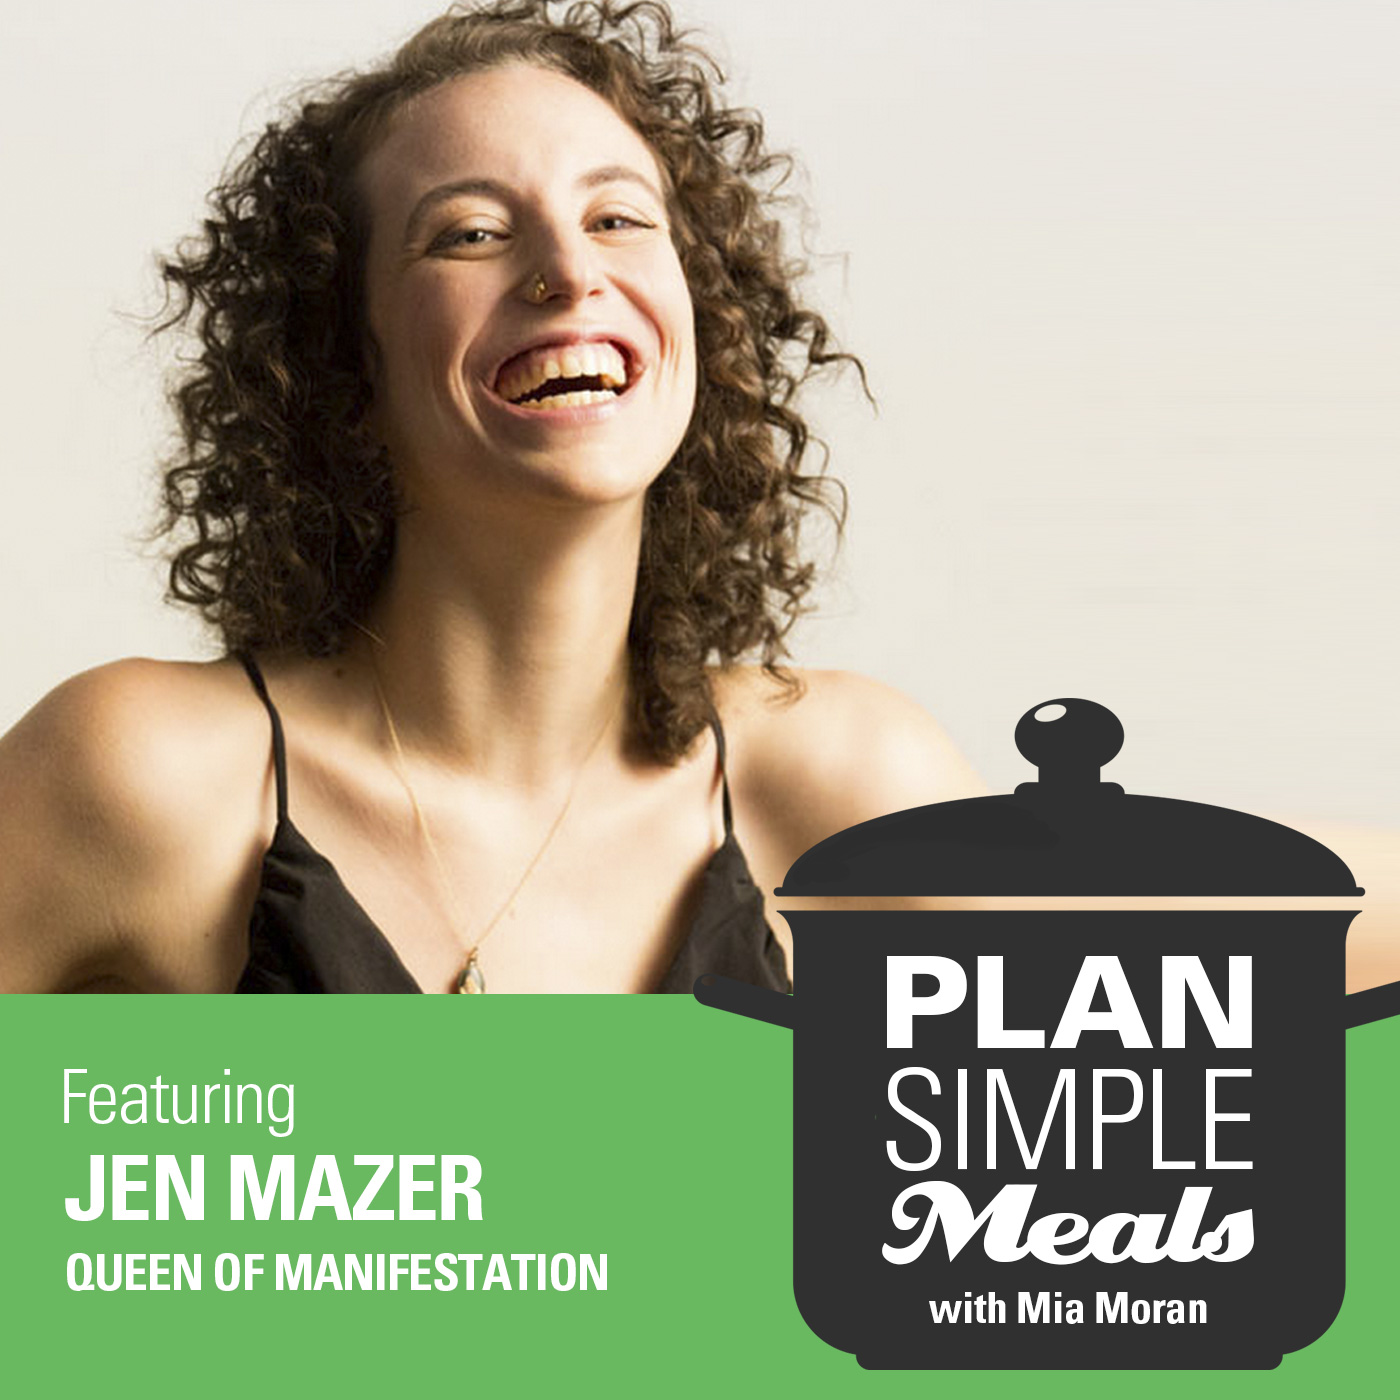 Manifesting Change With Jen Mazer